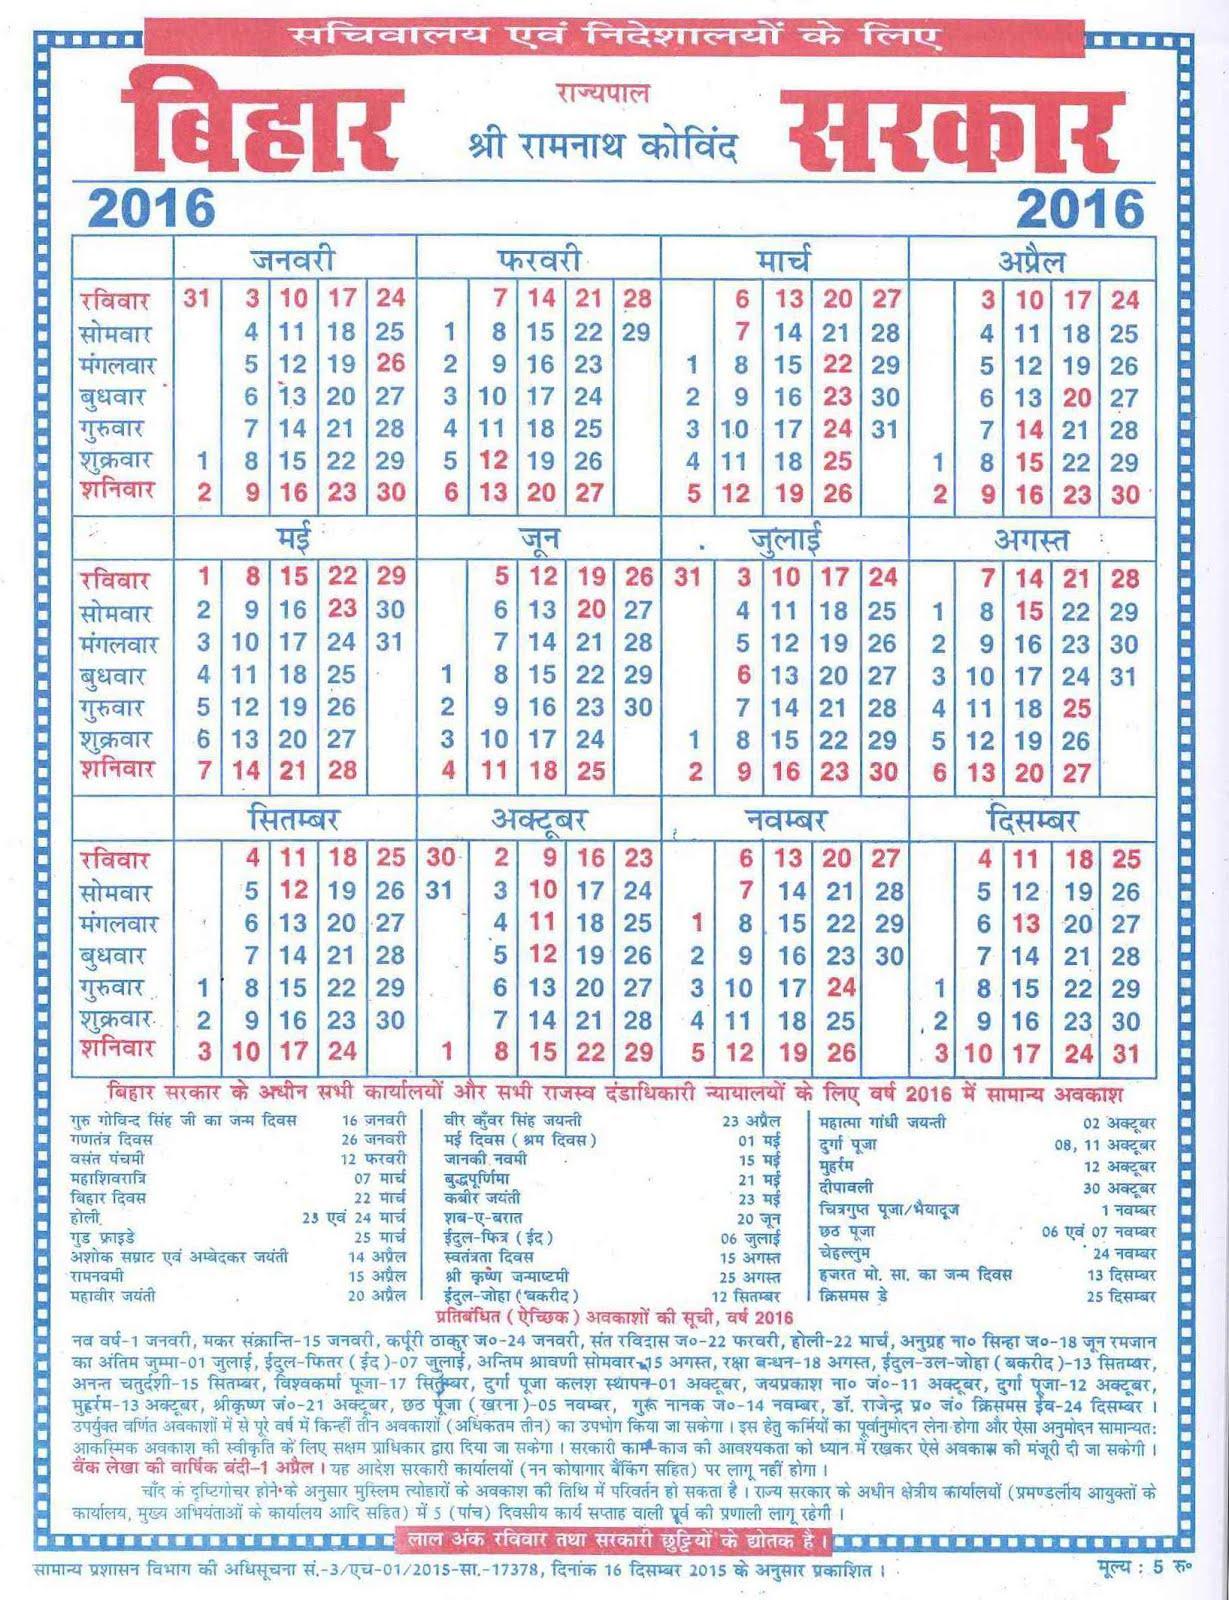 Bihar Government Calendar 2016 within Bihar Govt Calendar 2020 Pdf